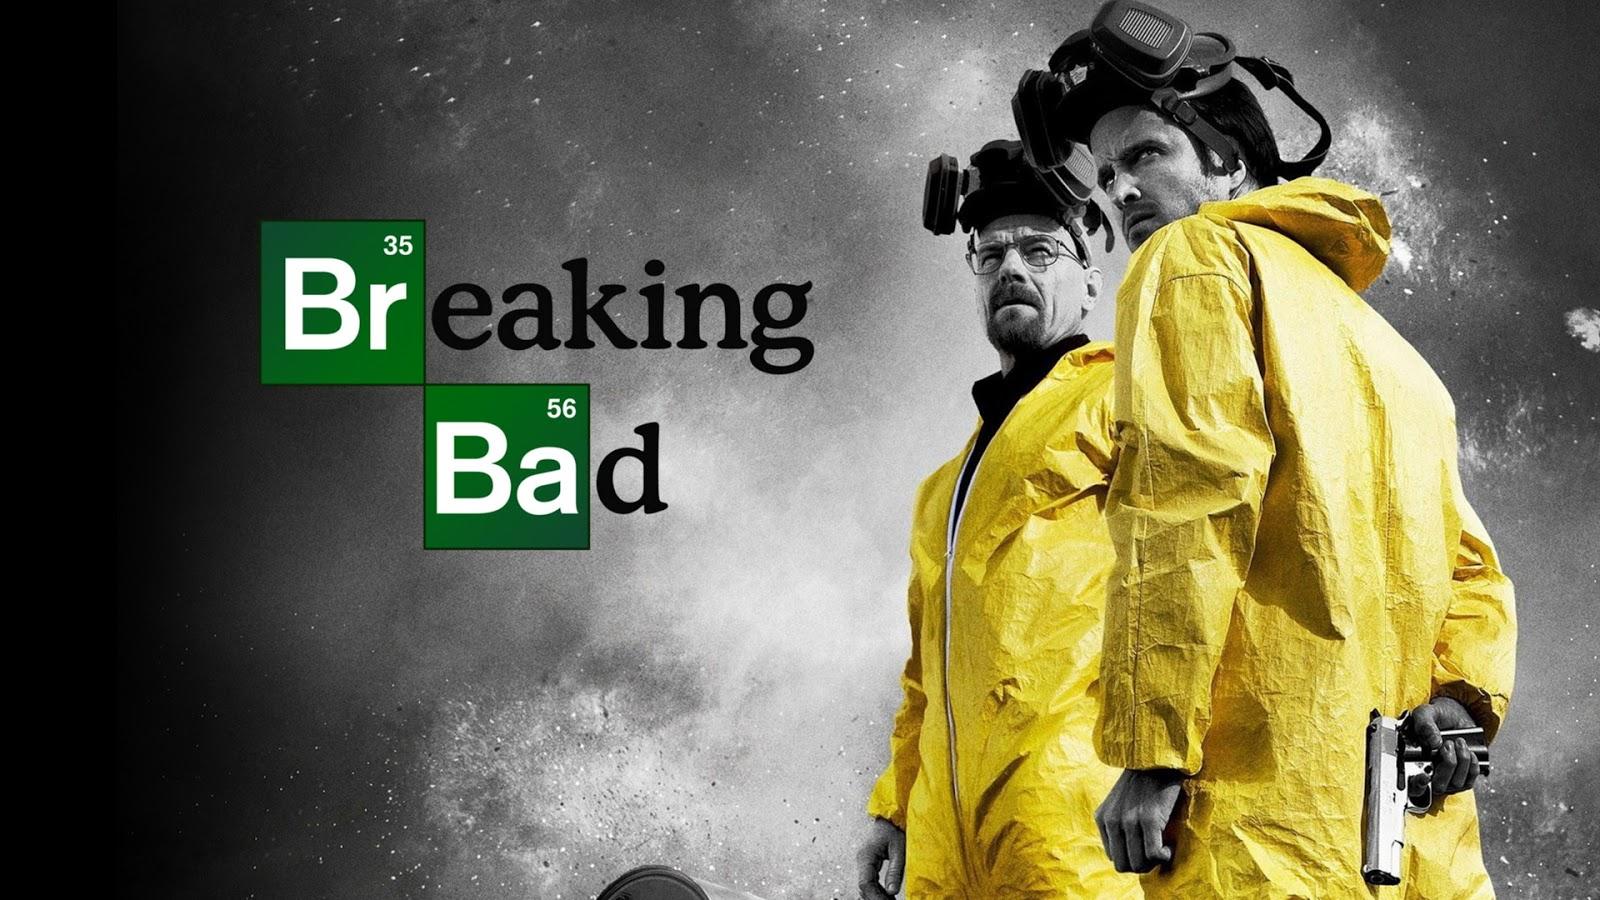 Latest Full Episodes of Breaking Bad Online - AMC